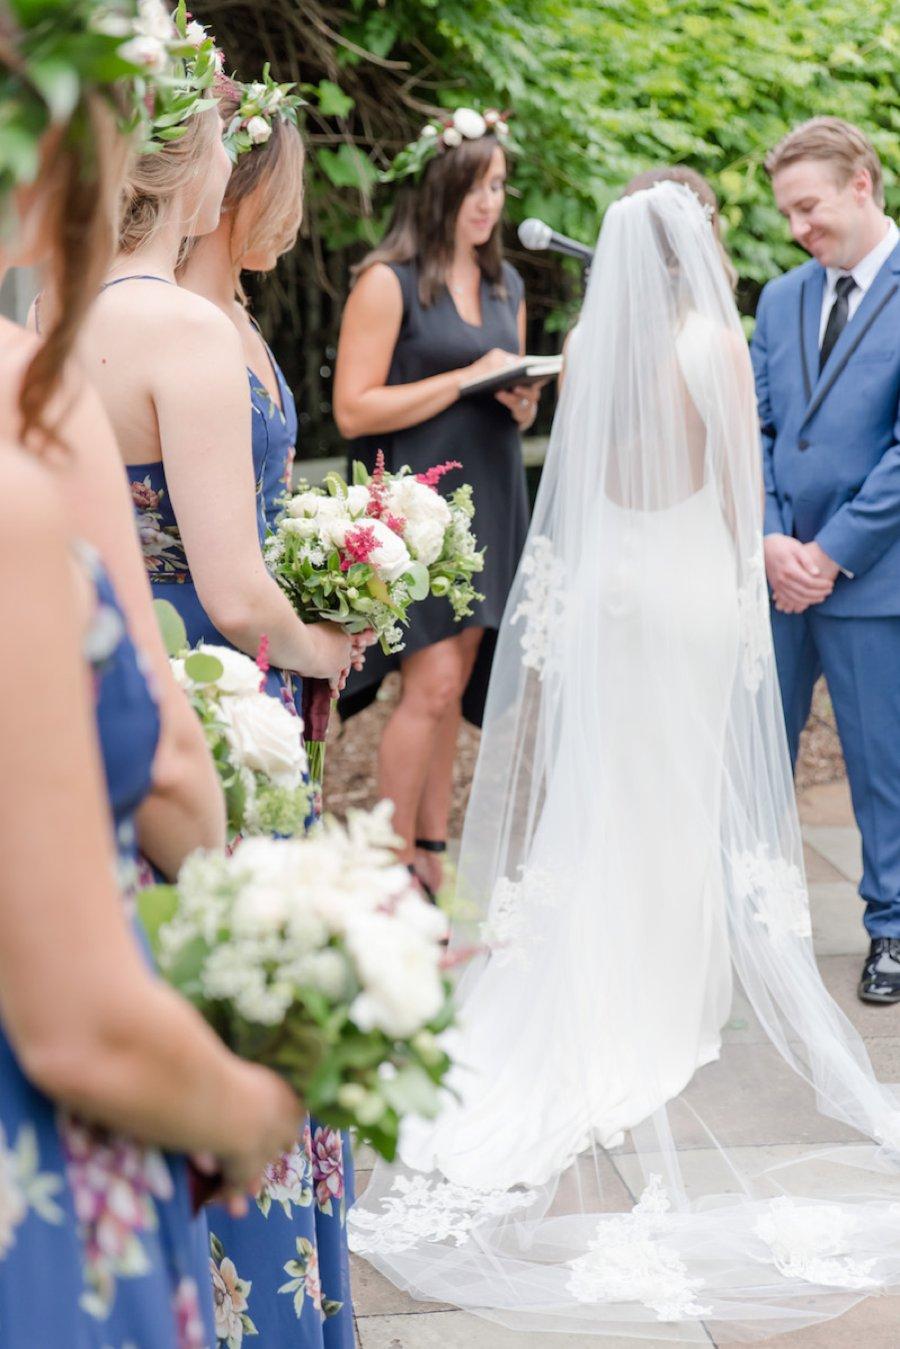 A Summer Red & Blue Rustic Boho Hudson Valley Wedding via TheELD.com